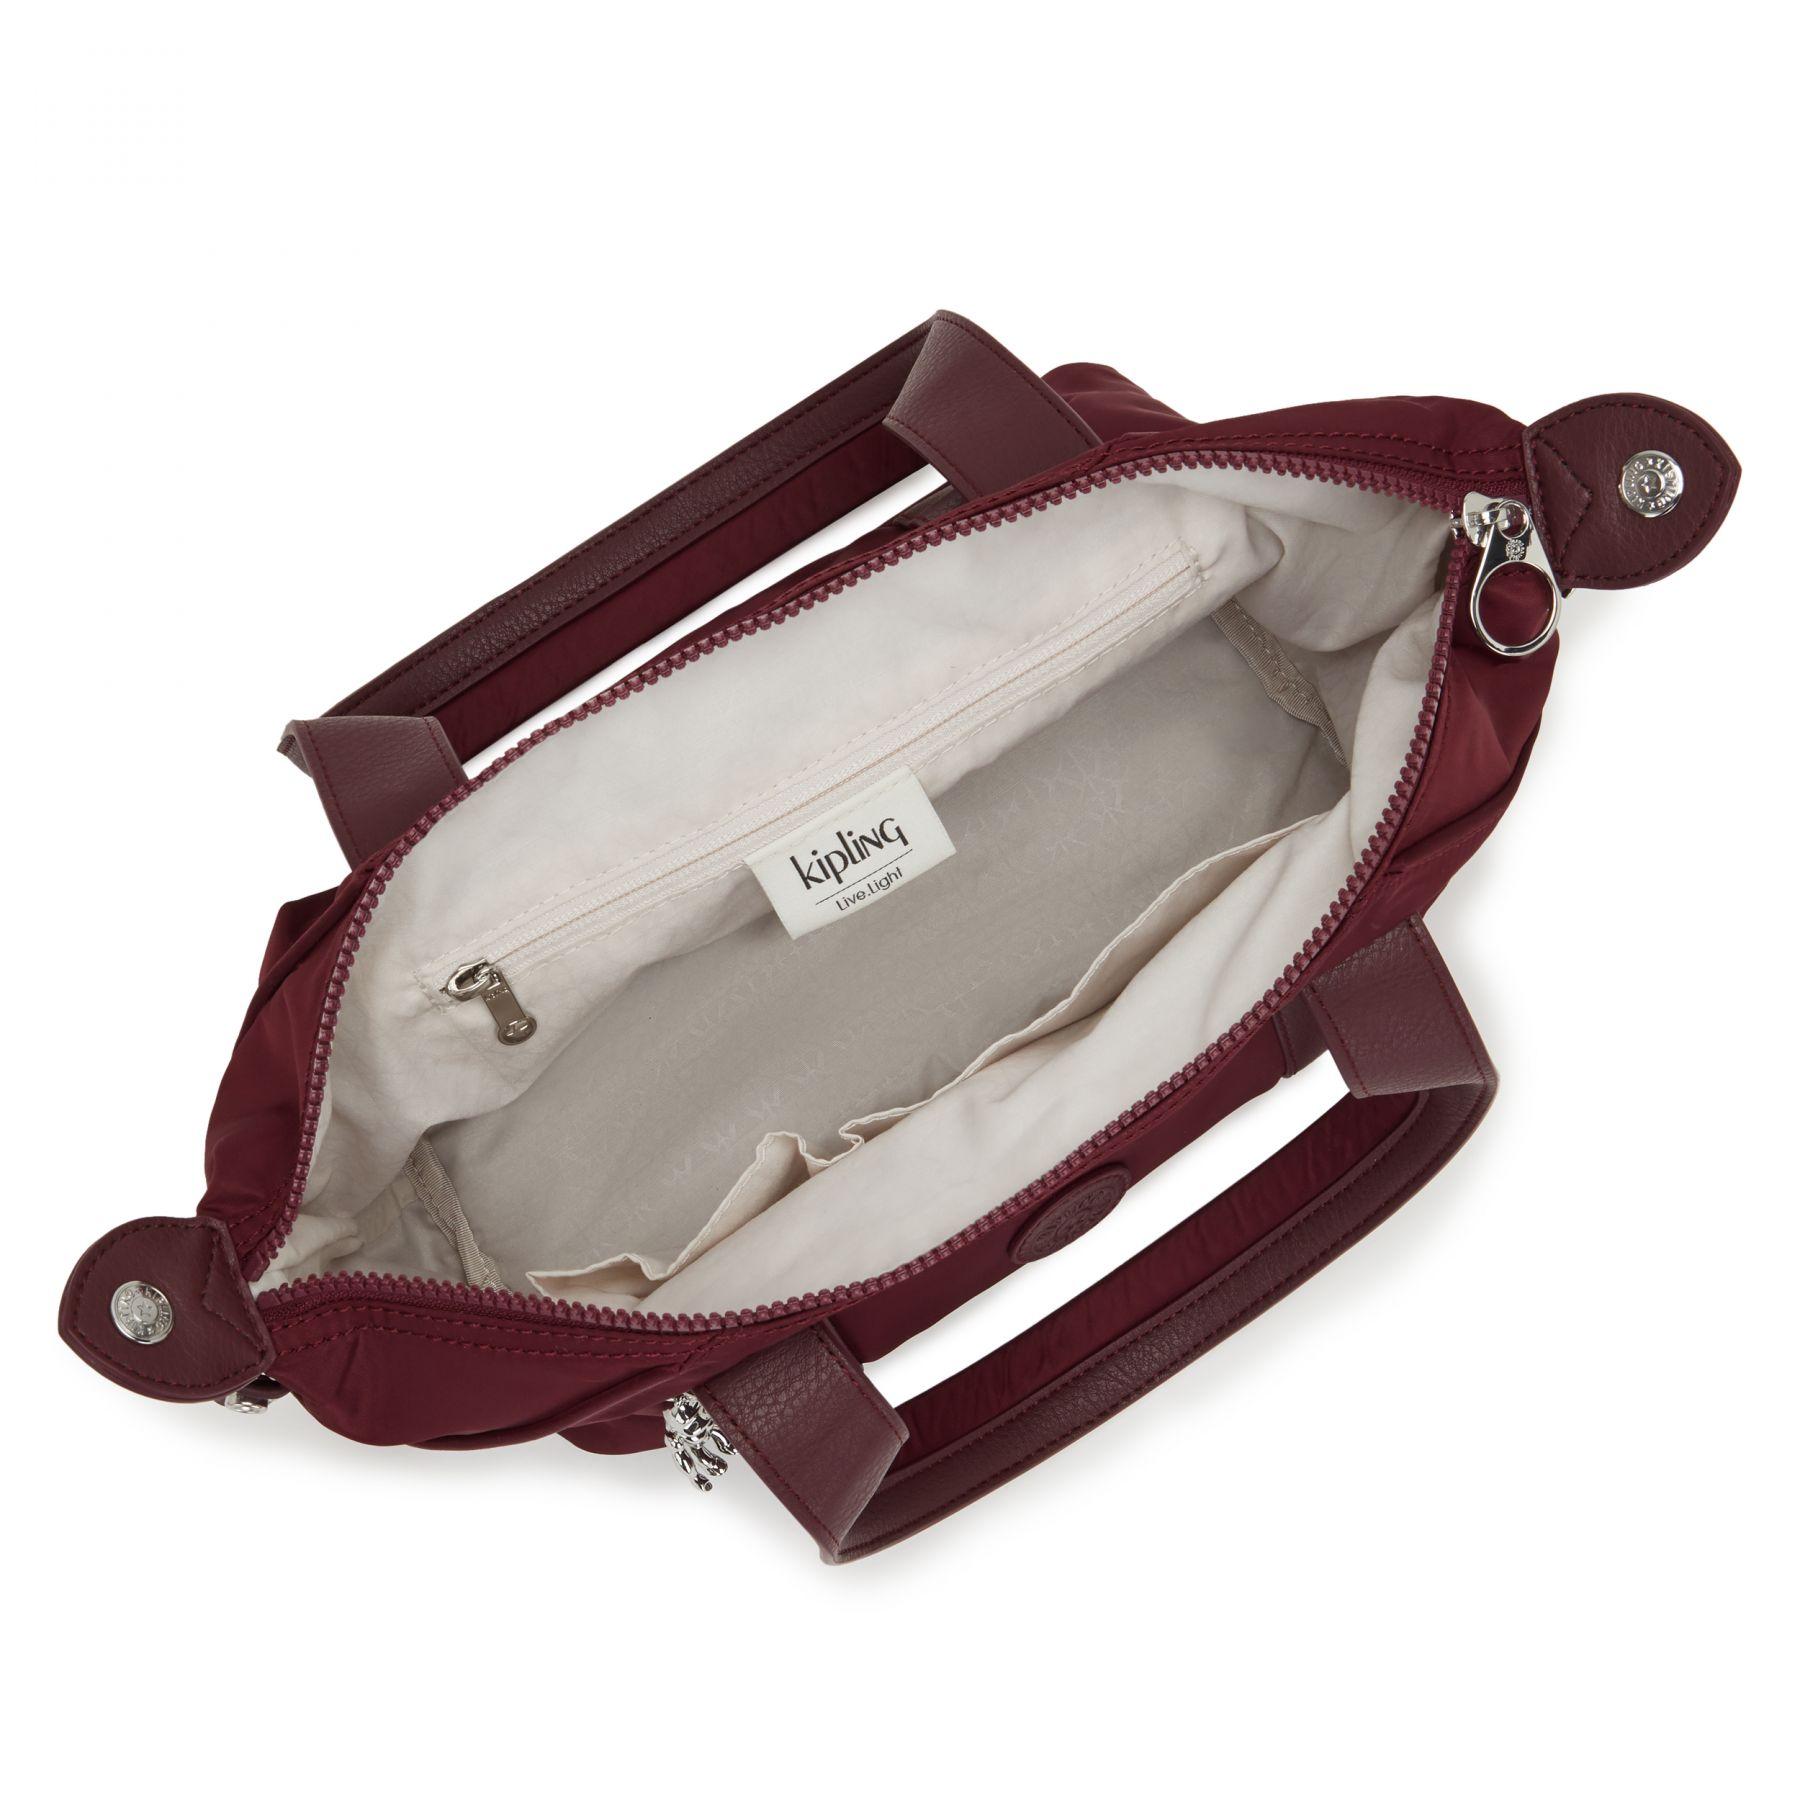 ART MINI BAGS by Kipling - Inside view